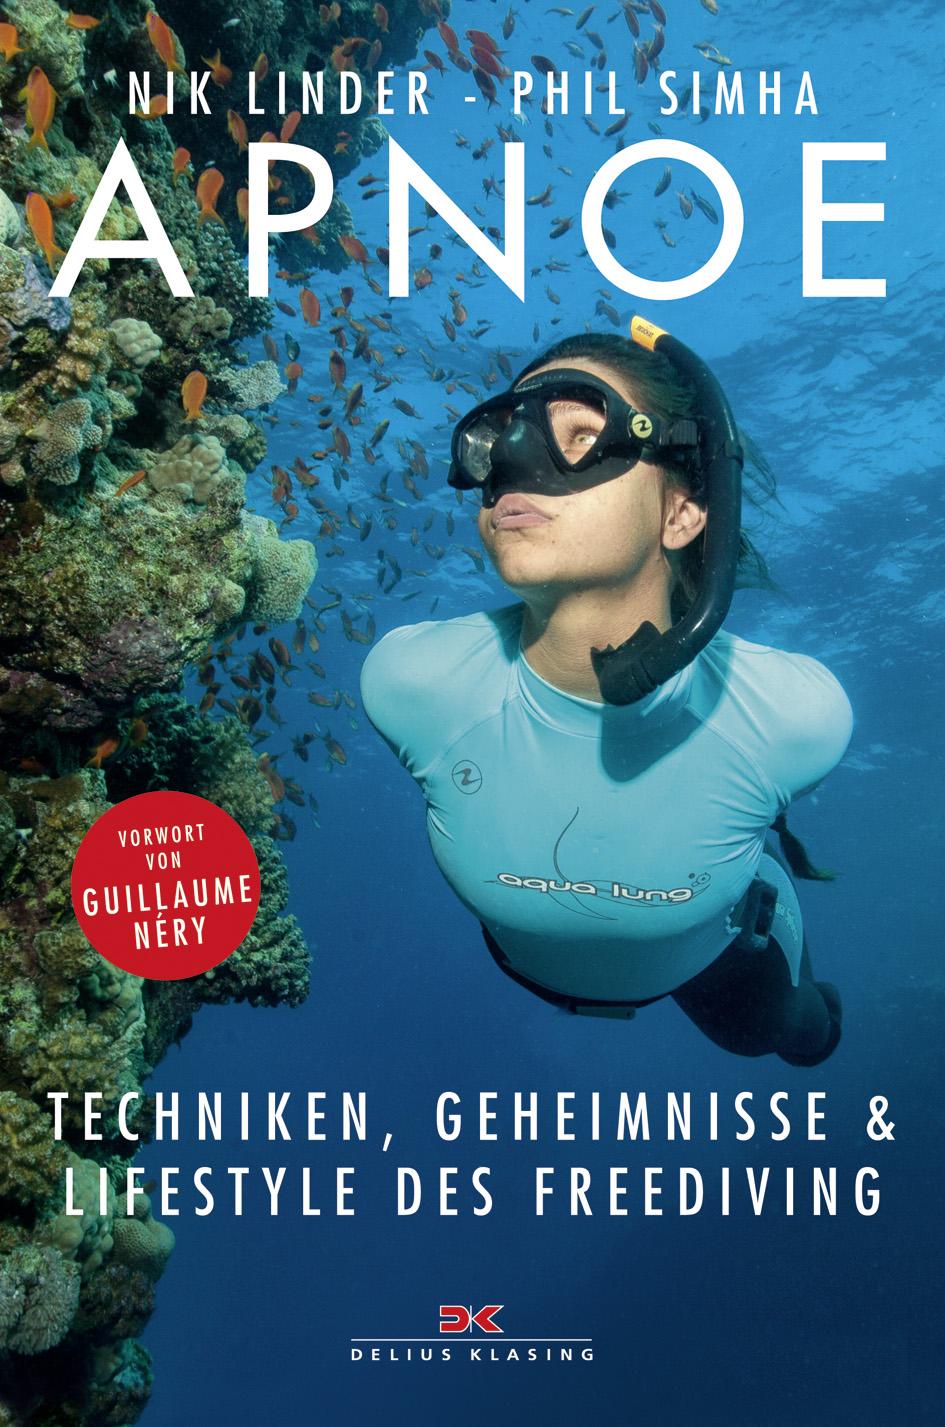 Apnoe - Lifestyle und Technik